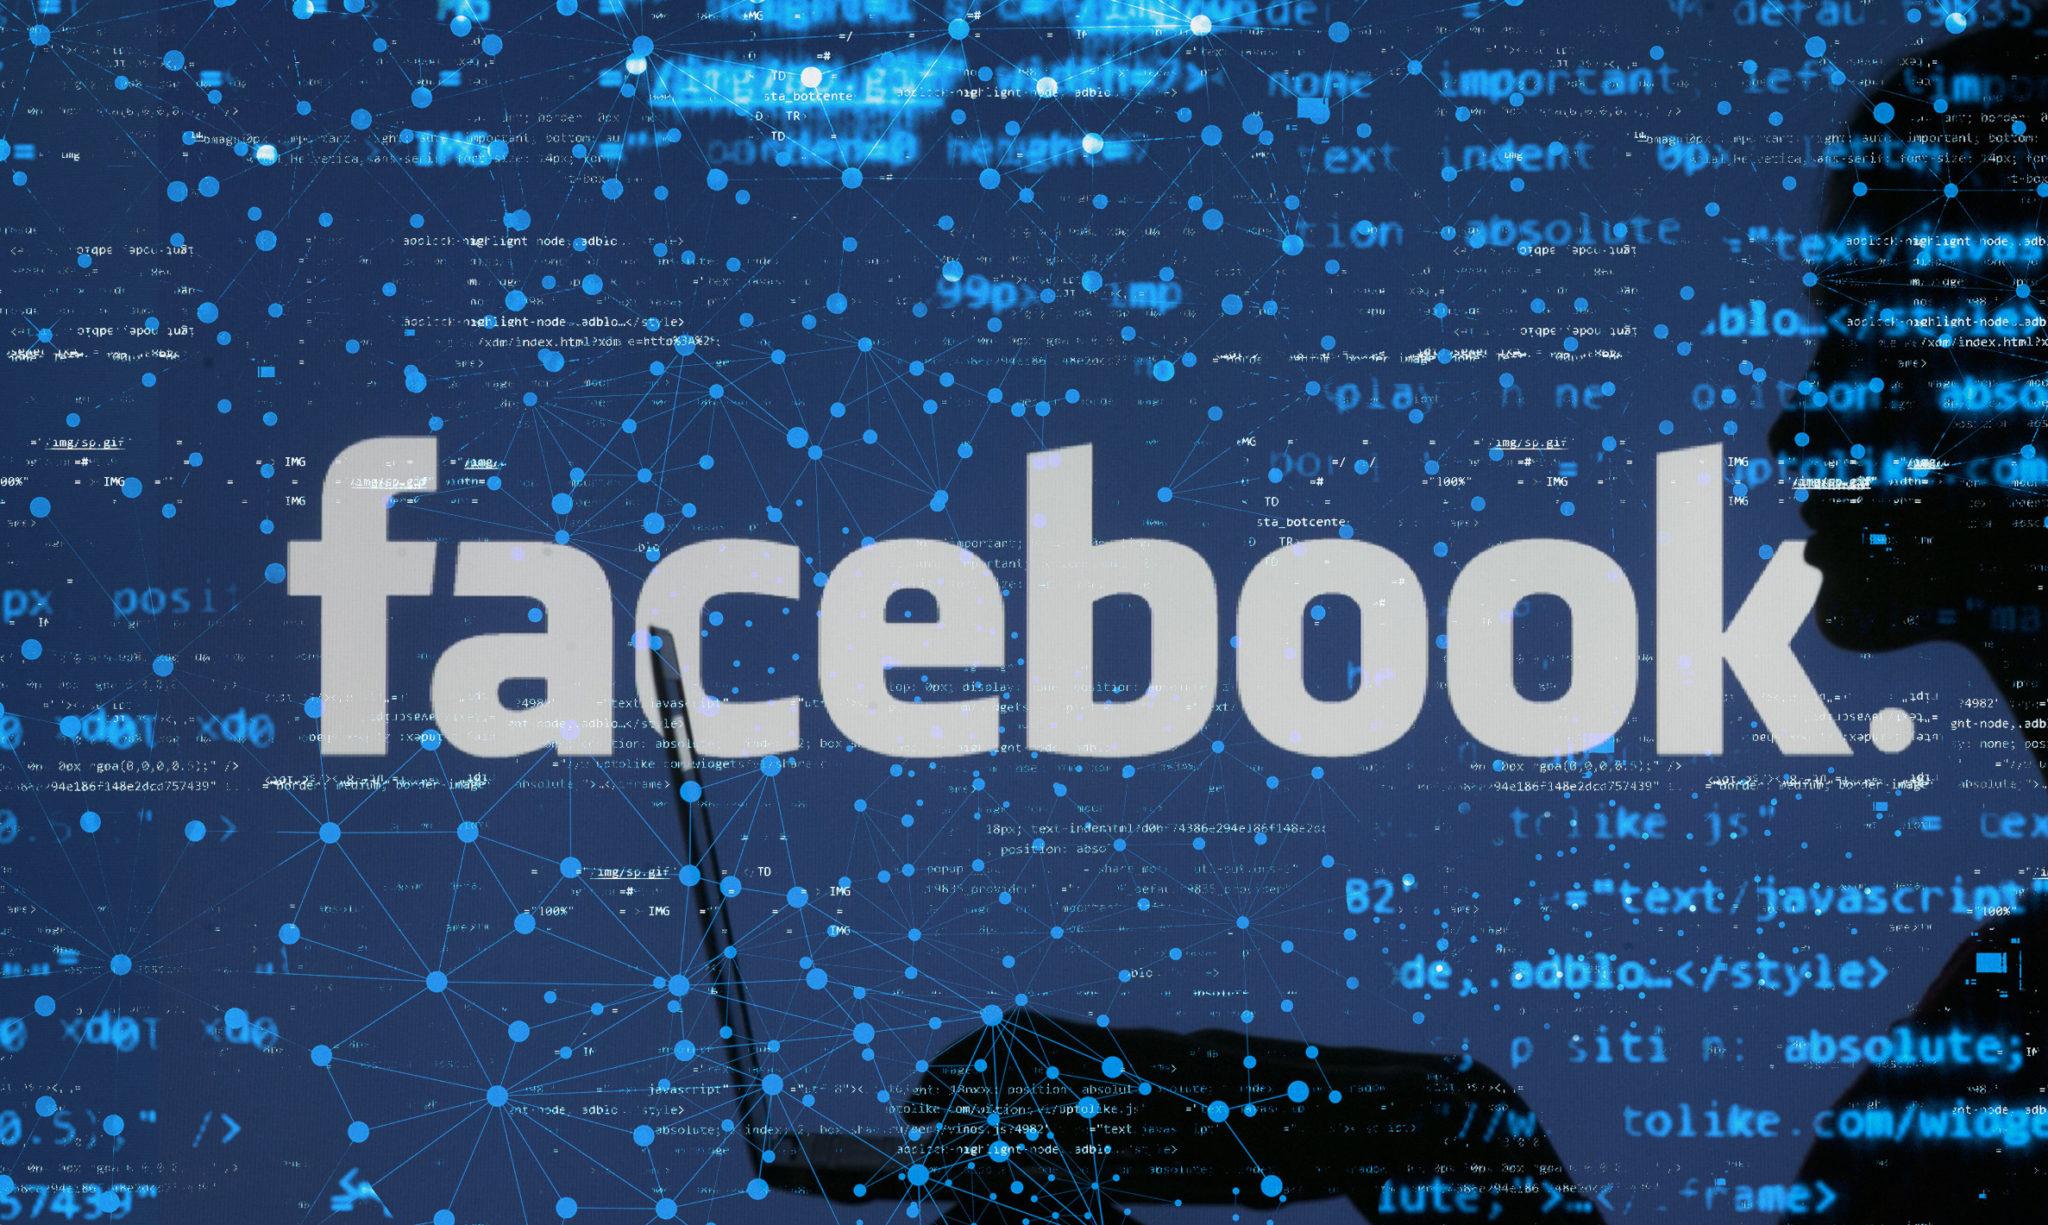 HOAX Alert: Νέο ψευδές κείμενο στο Facebook - Δεν ισχύουν οι ισχυρισμοί